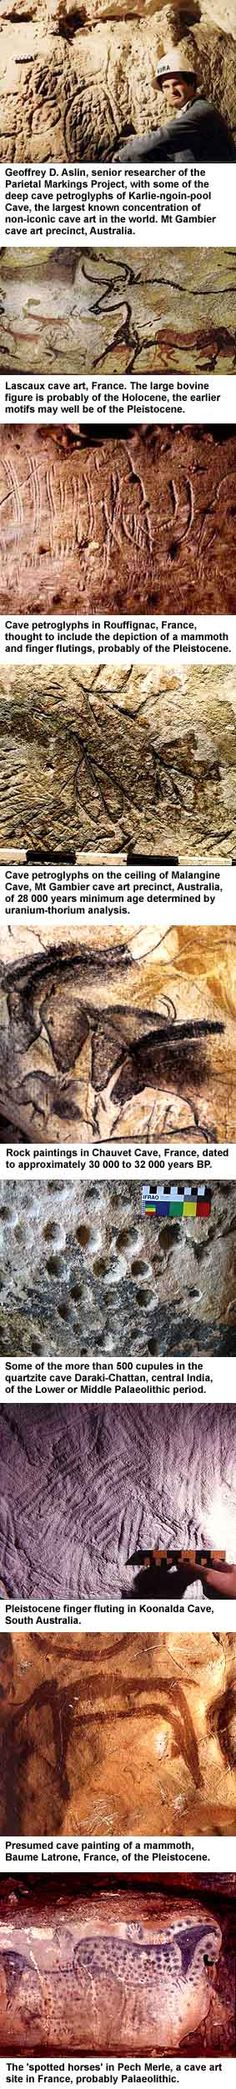 Chauvet cave horses